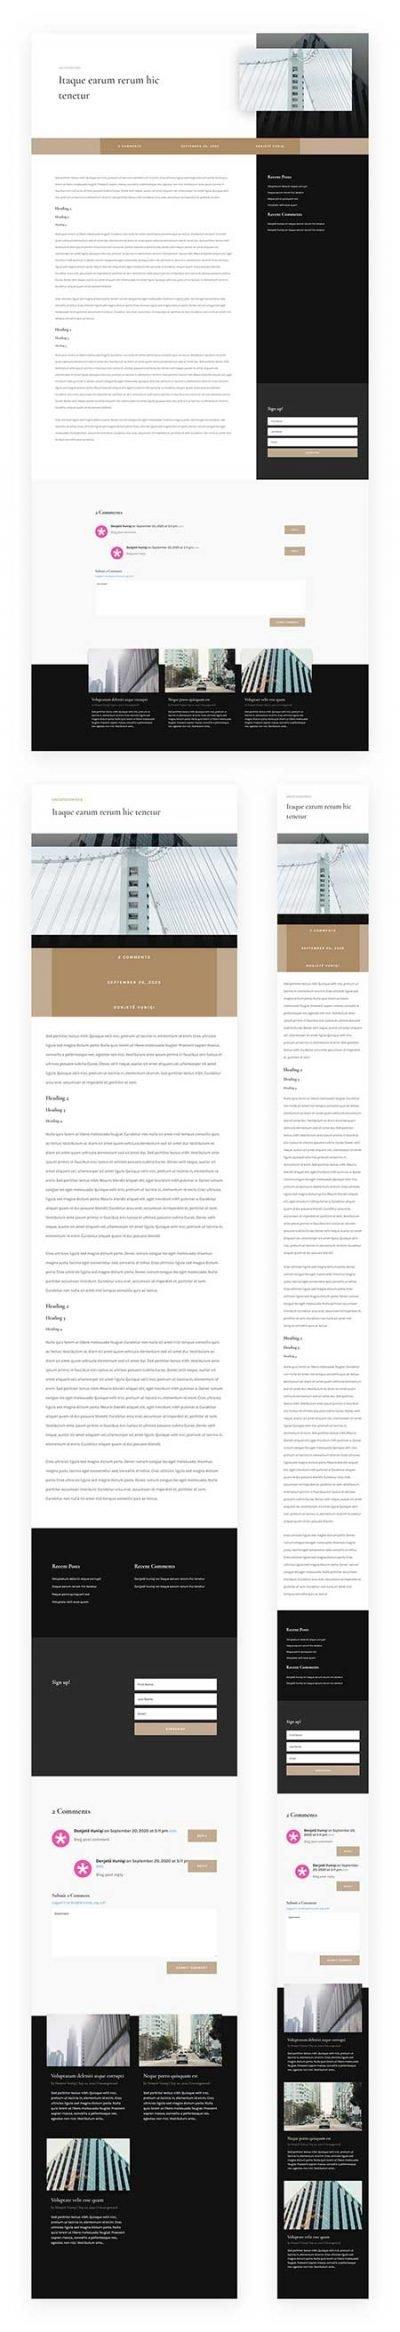 Divi blog post for architects website